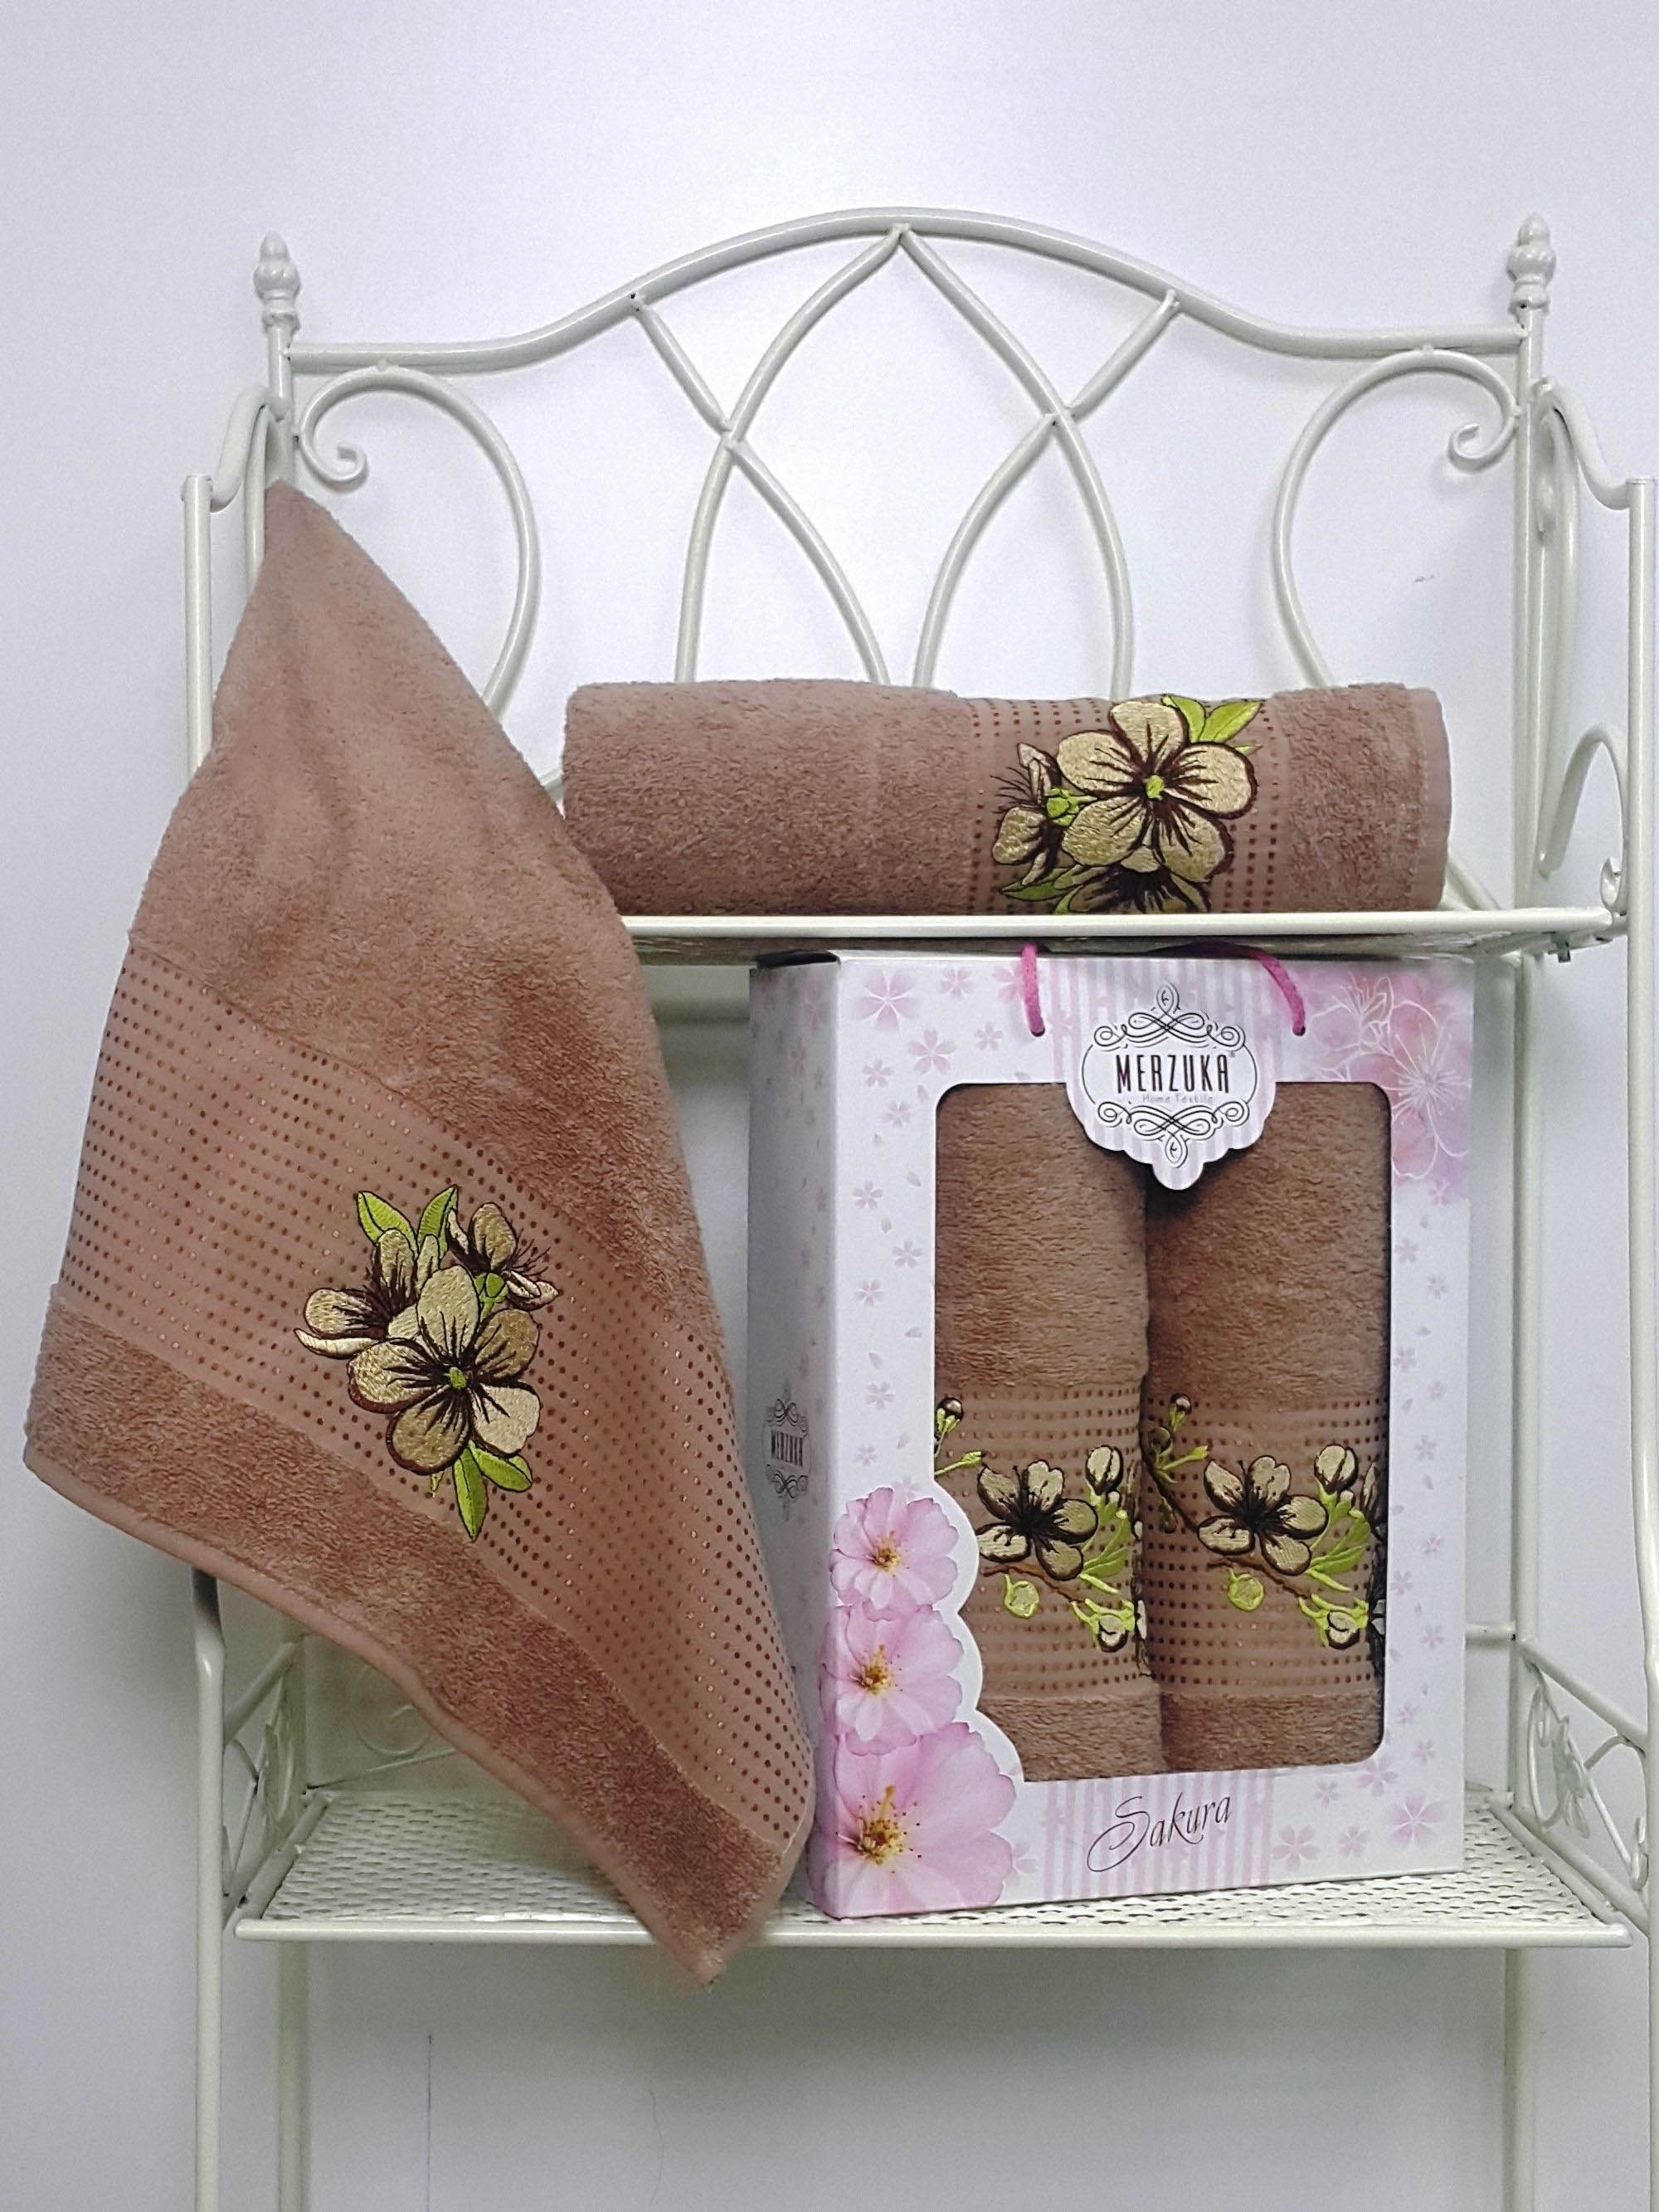 Полотенца Oran Merzuka Полотенце Sakura Цвет: Коричневый (Набор) набор из 3 полотенец merzuka sakura 50х90 2 70х140 8432 терракотовый